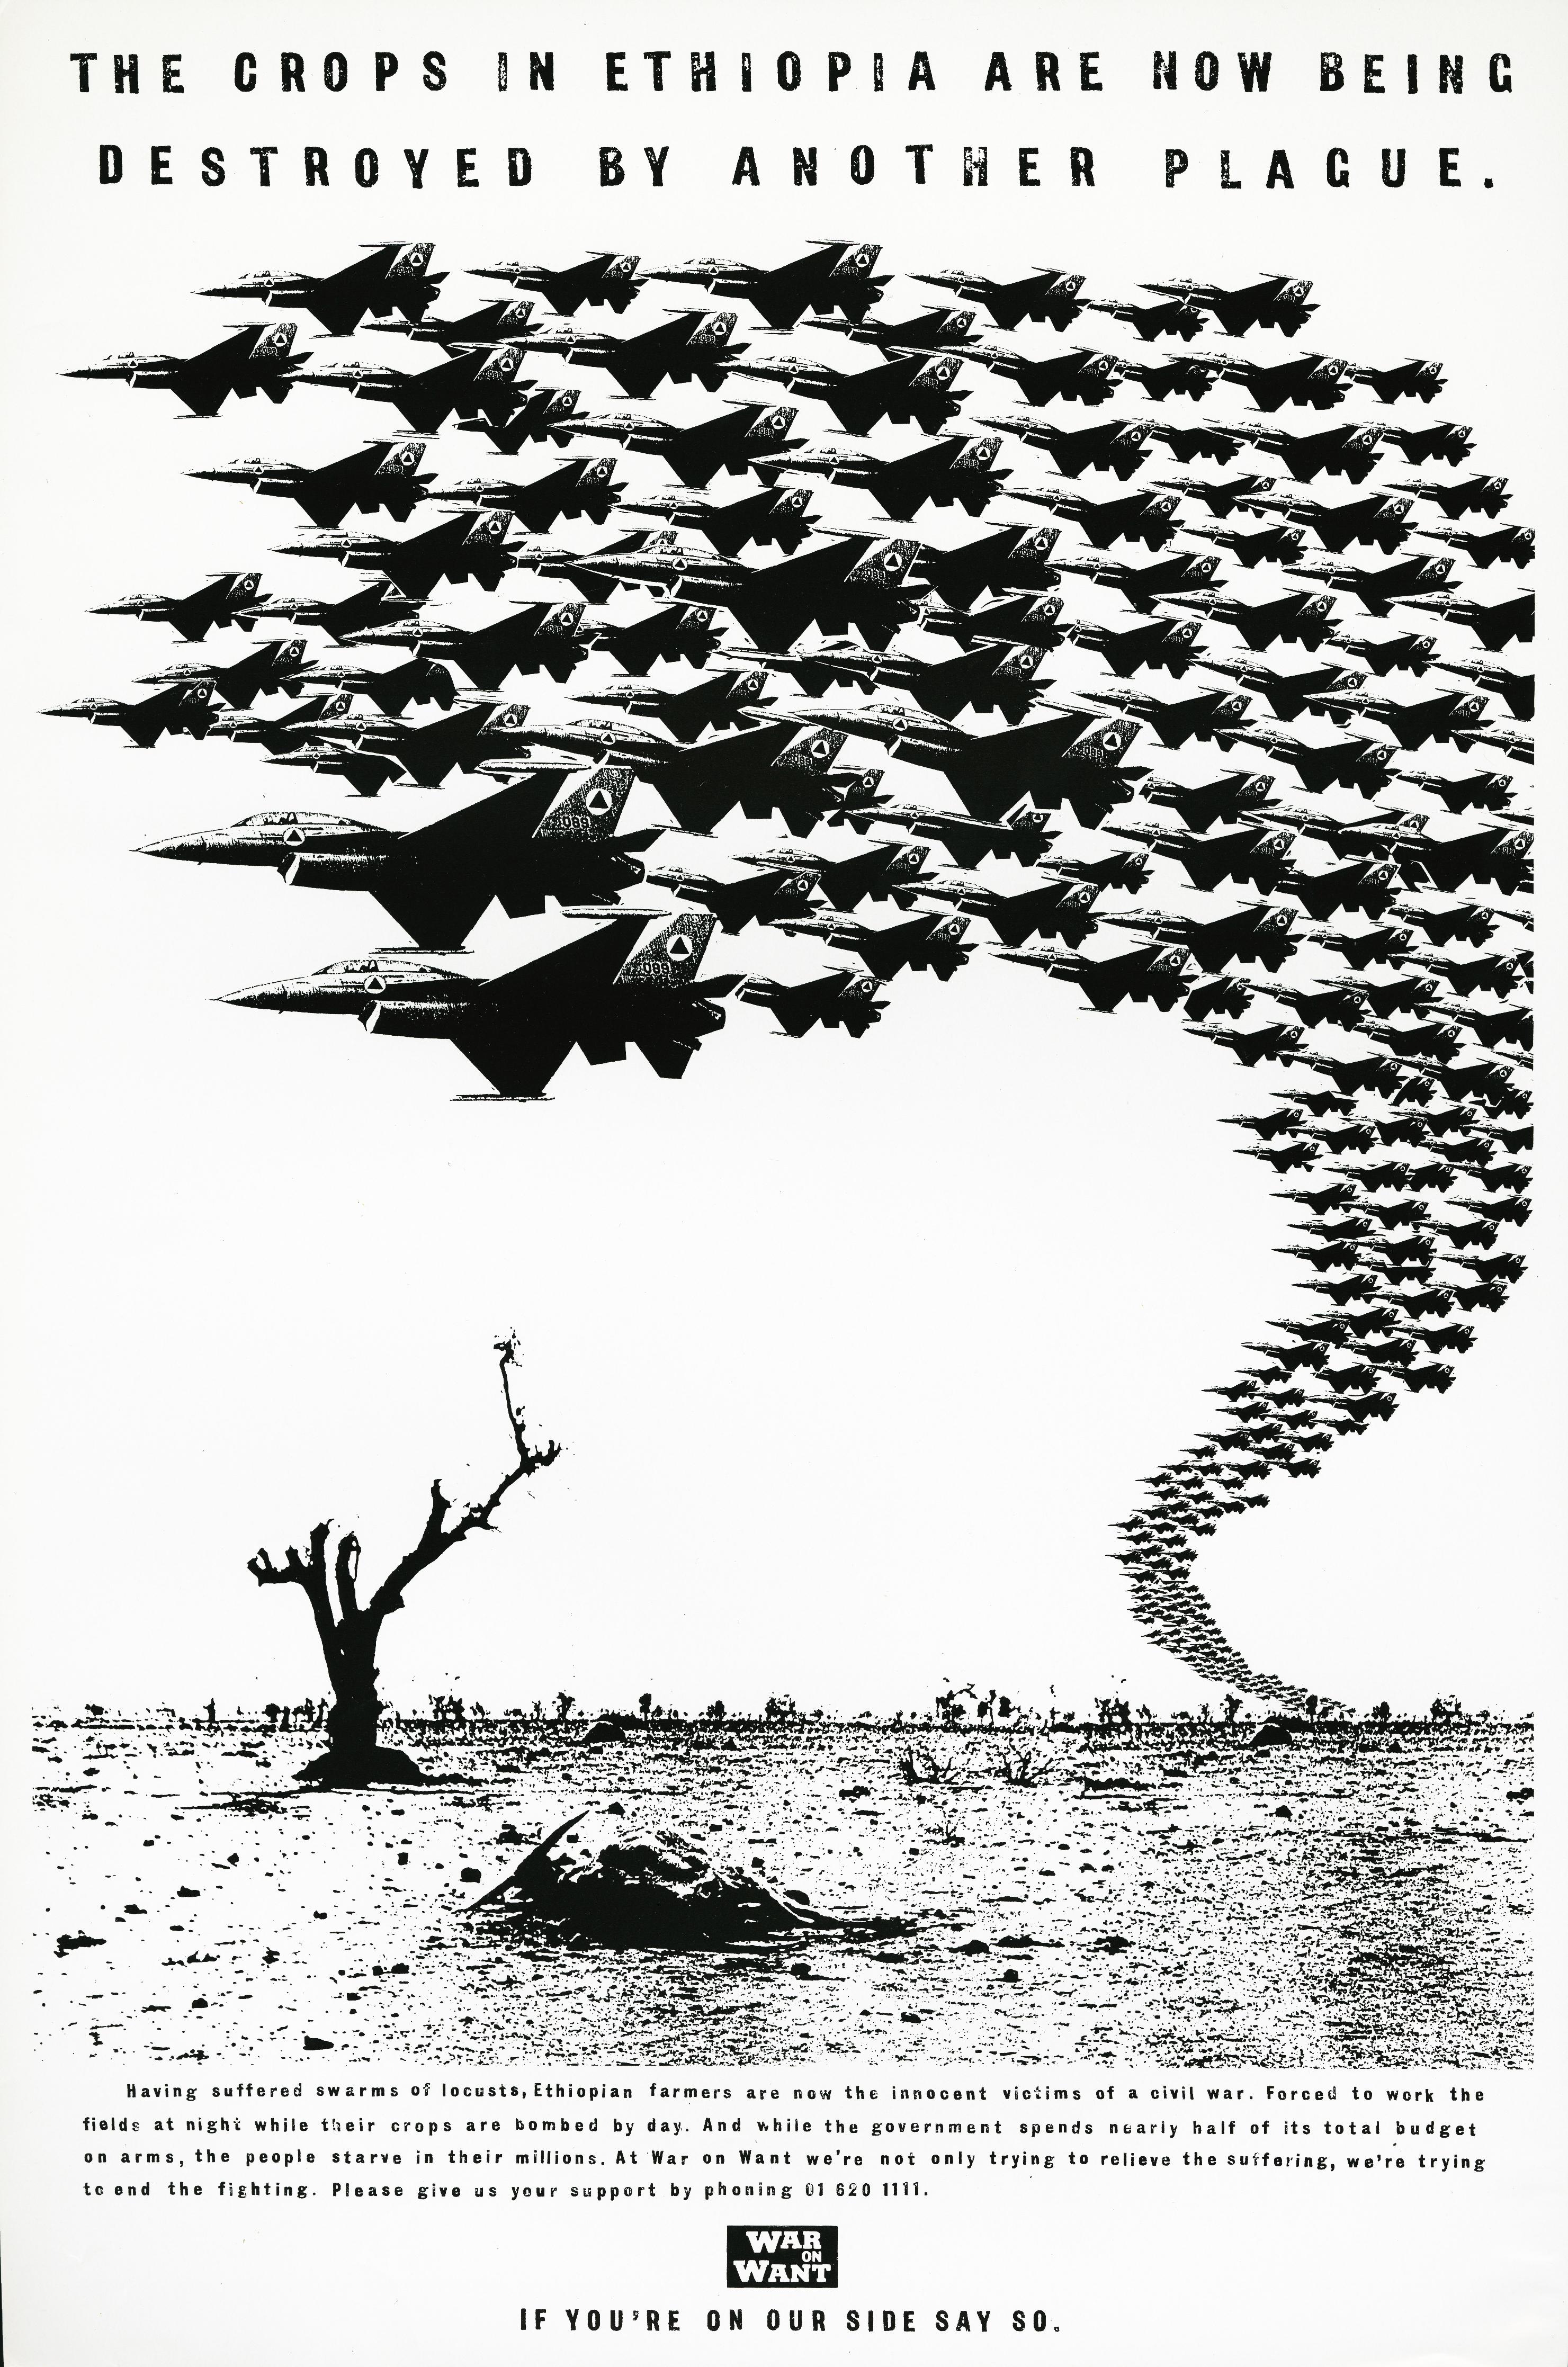 War On Want - 'Swarm', Dave Wakefield, Tony Davidson, BMP:DDB